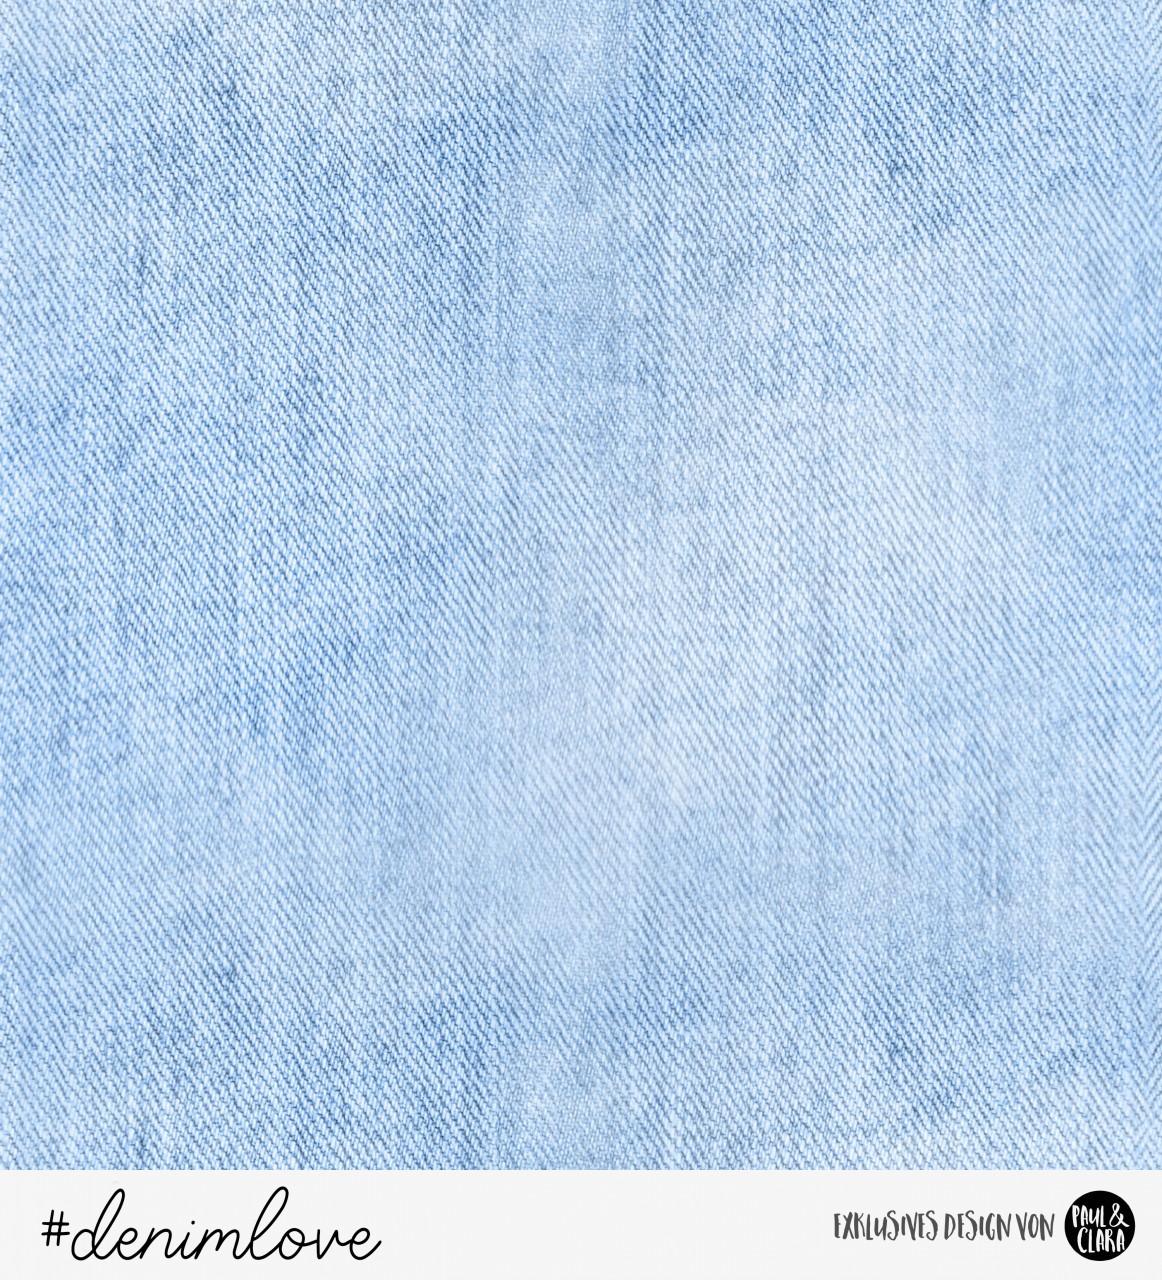 96 cm RESTSTÜCK-denimlove  - Hellblau *Bio-Sommersweat*